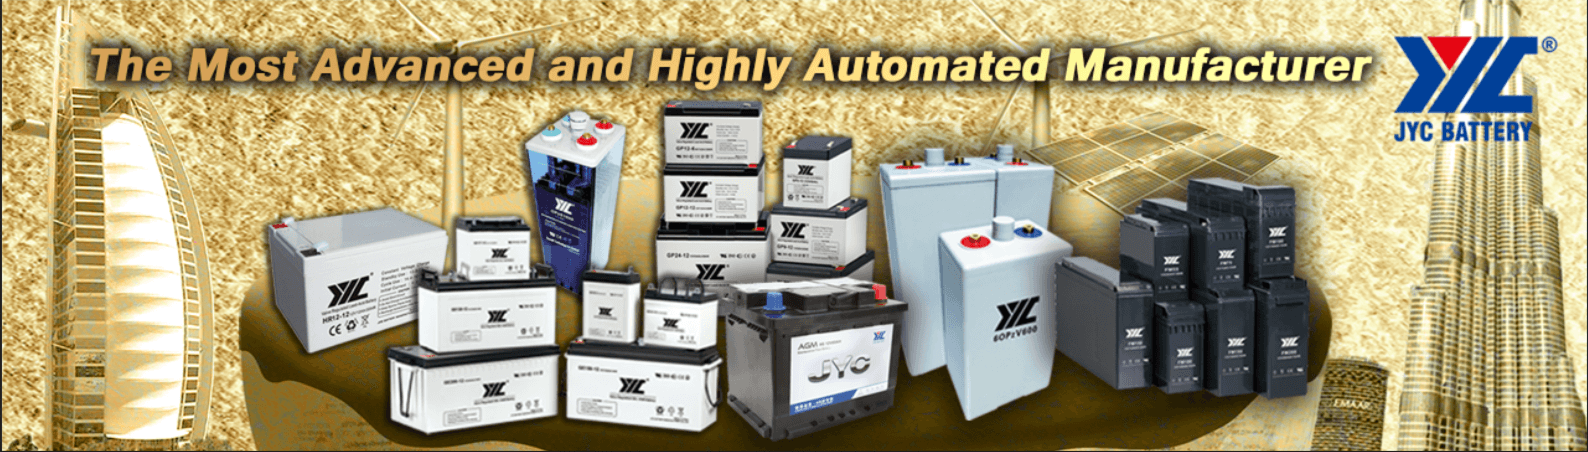 JYC Battery Manufacturer Co., Ltd.